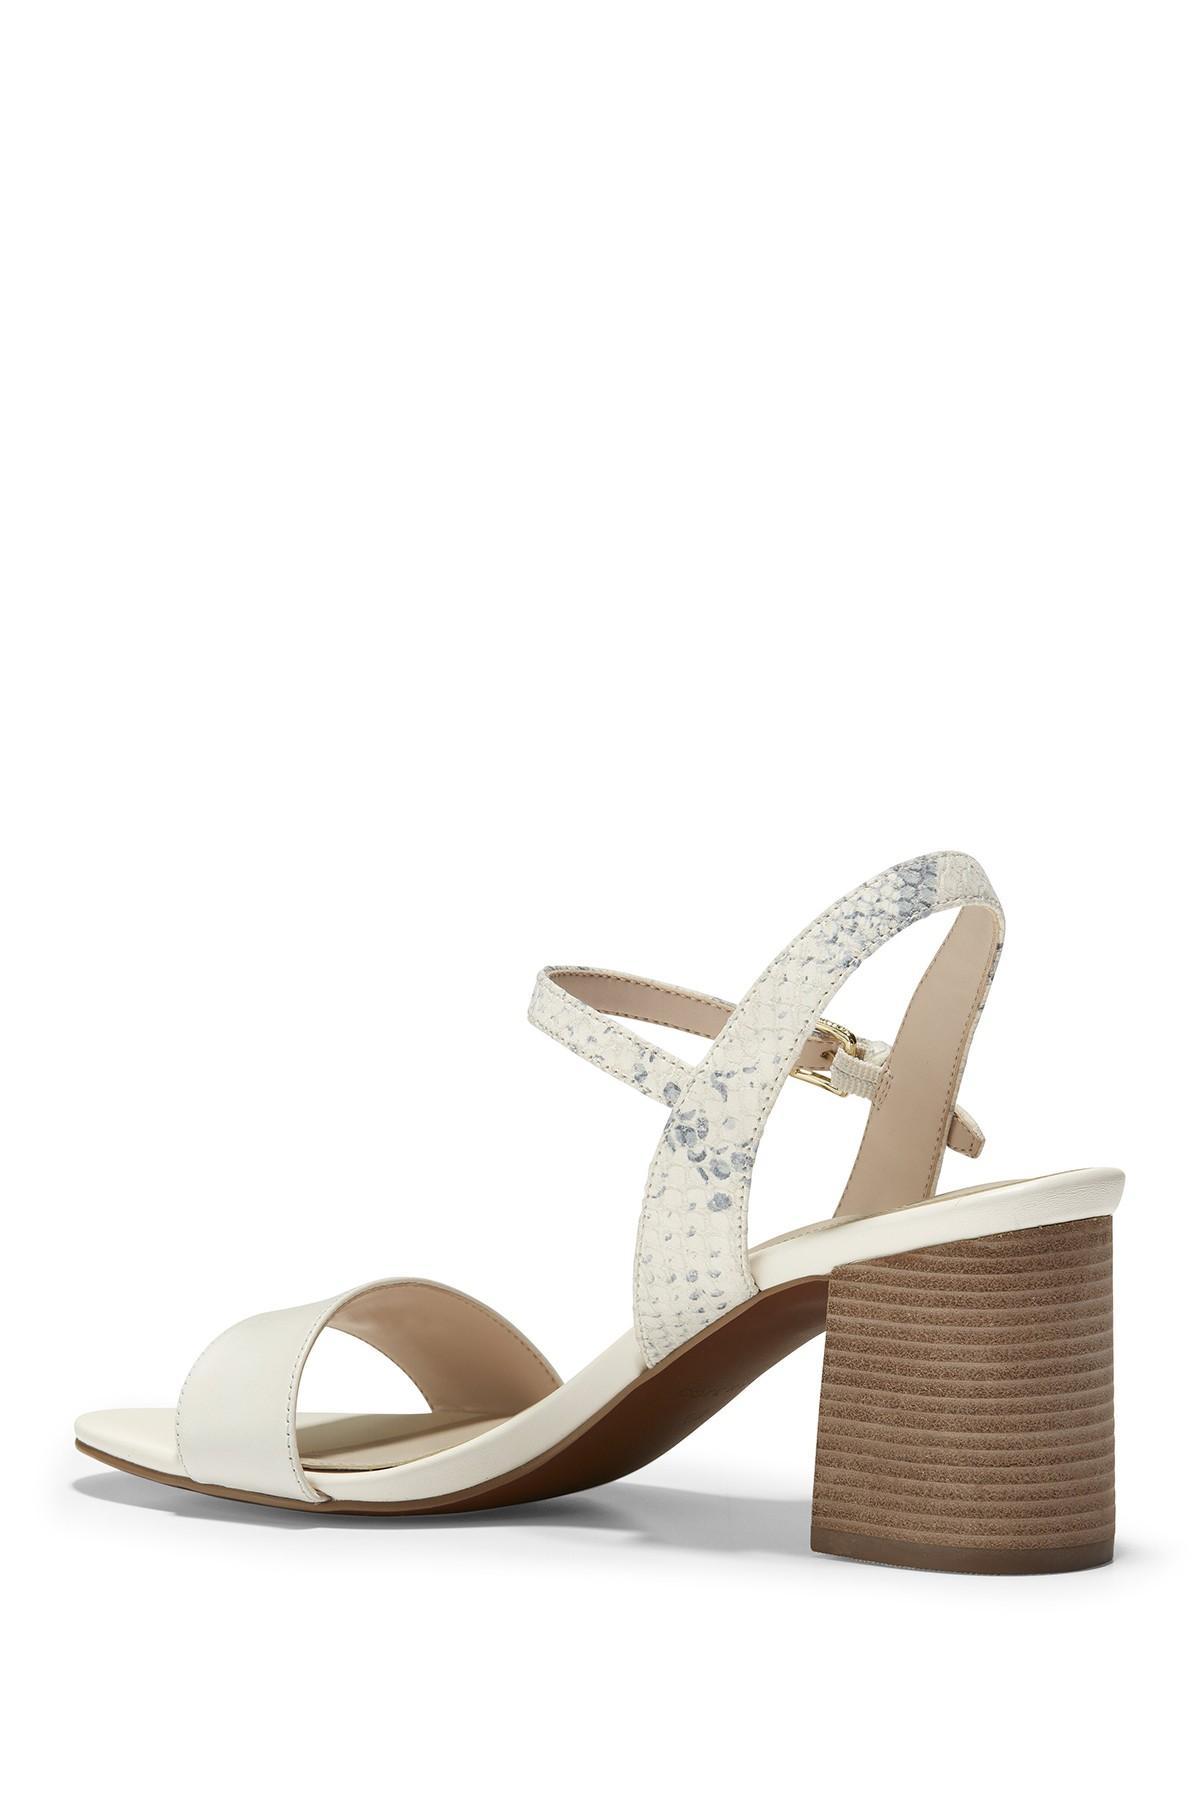 477dcb8f5ae Cole Haan - Multicolor Josie Block-heel Sandals - Lyst. View fullscreen